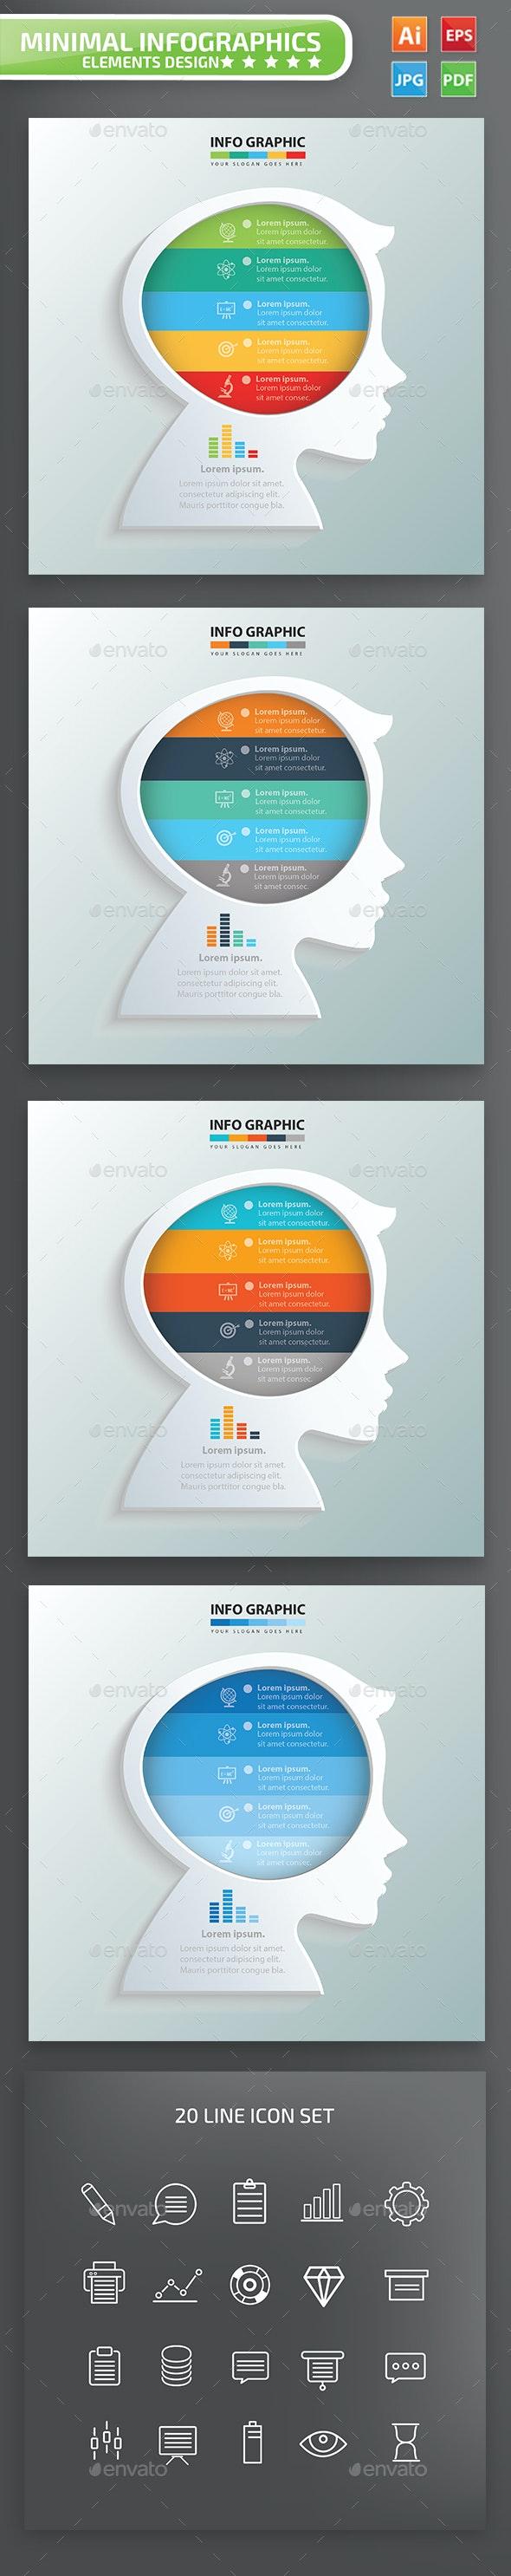 Creative Infographic Design - Infographics